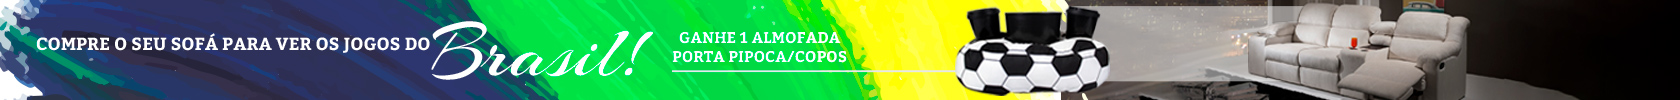 Jogos do Brasil Jun/18